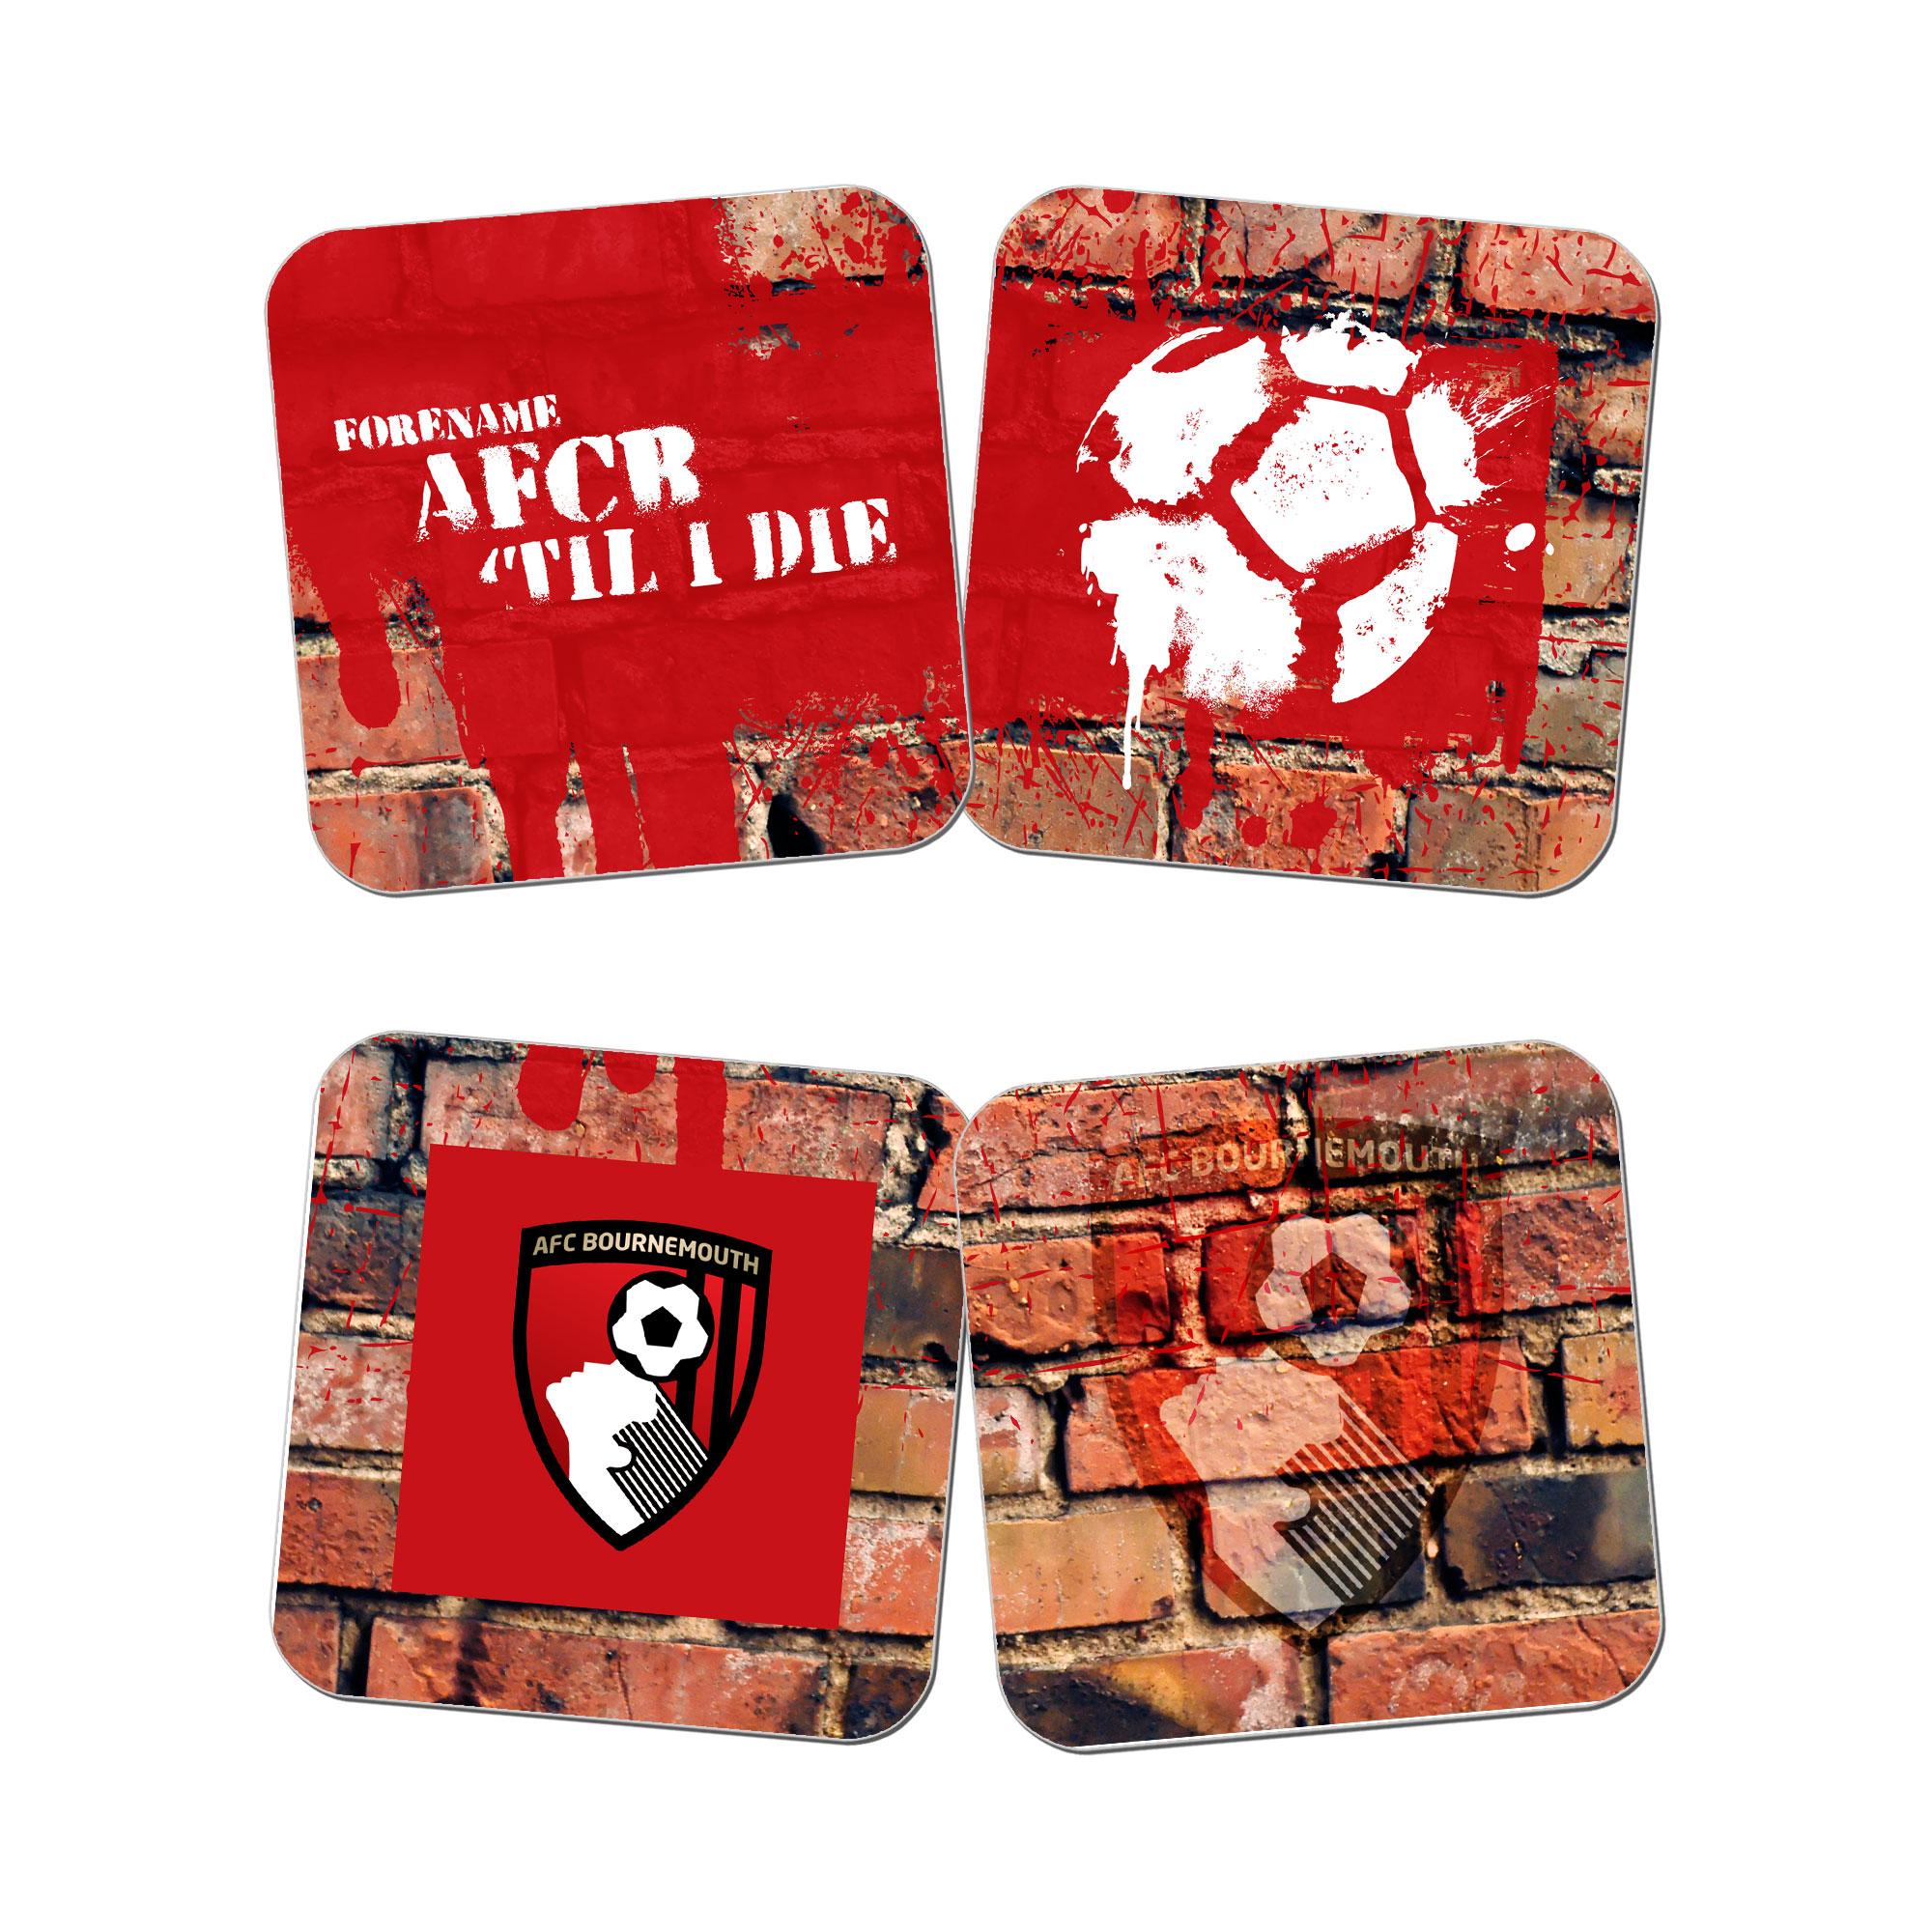 AFC Bournemouth 'Til I Die Coasters (x4)